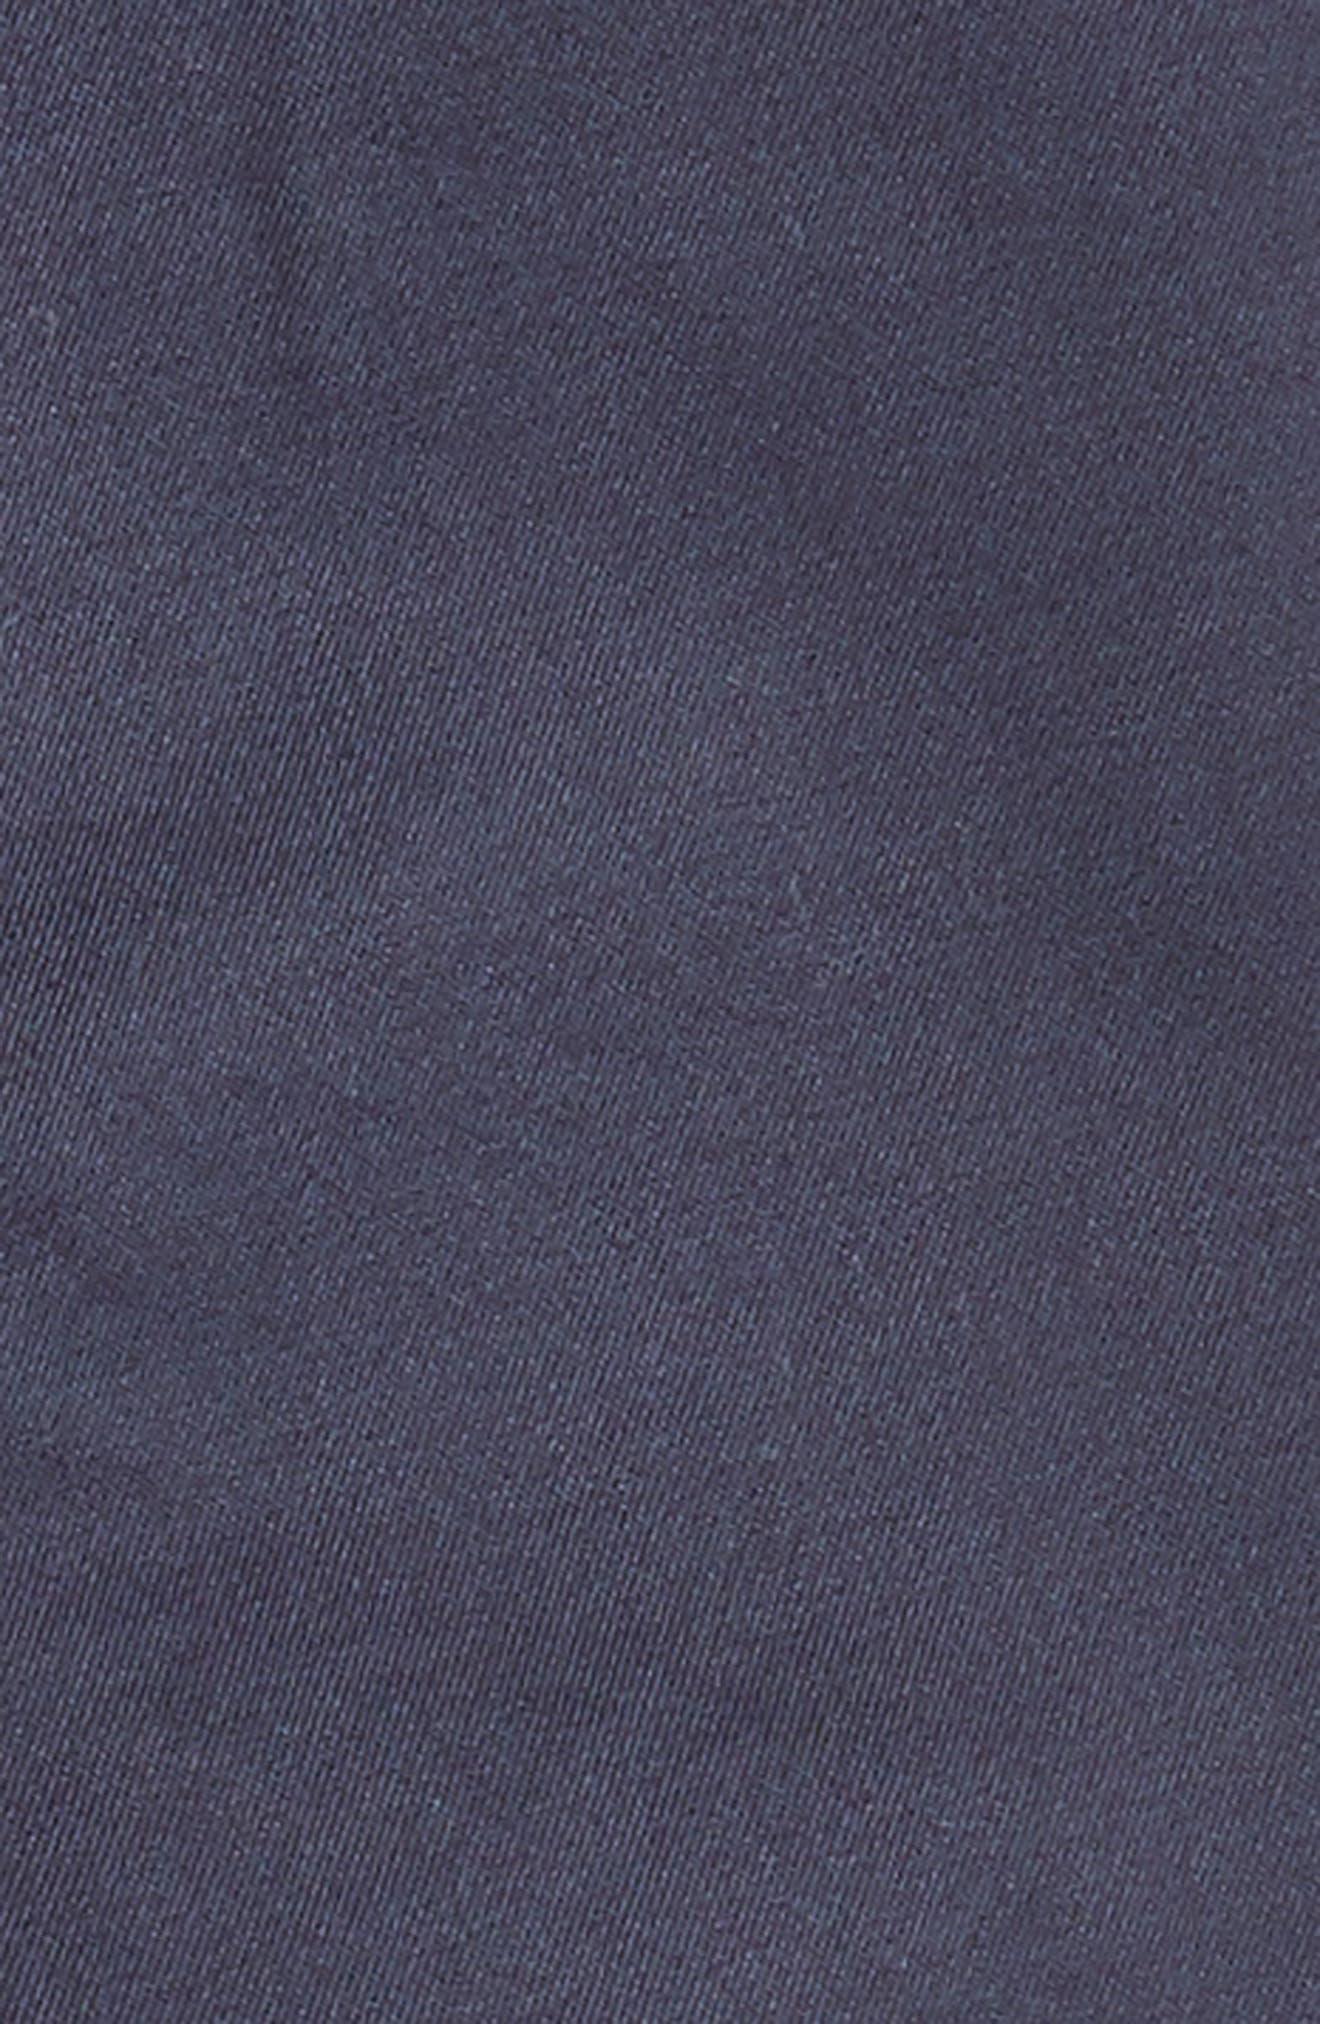 Alternate Image 3  - Armani Junior Cotton Twill Jogger Pants (Little Boys & Big Boys)